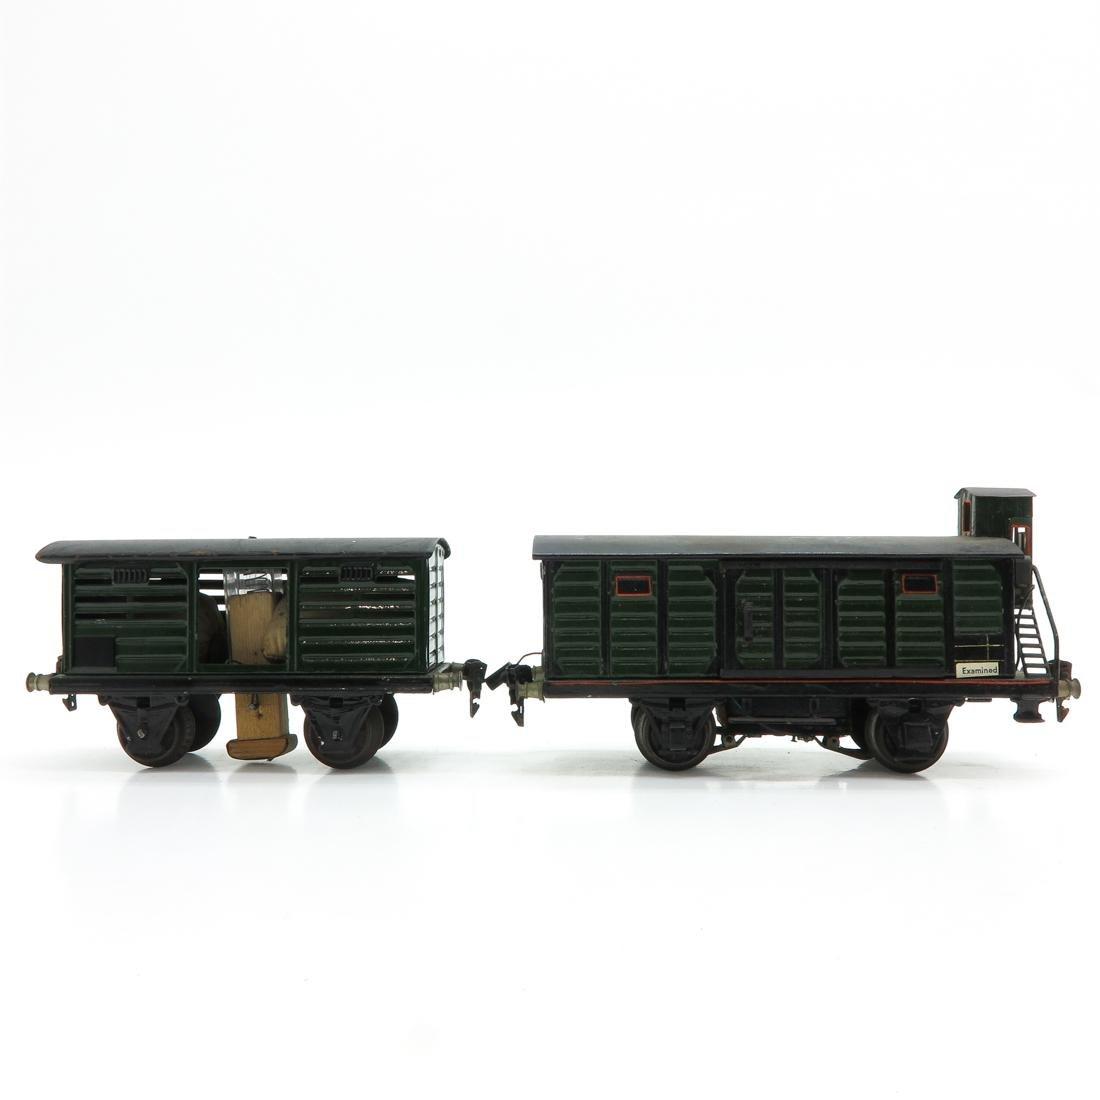 Lot of 2 Vintage Marklin Train Cars